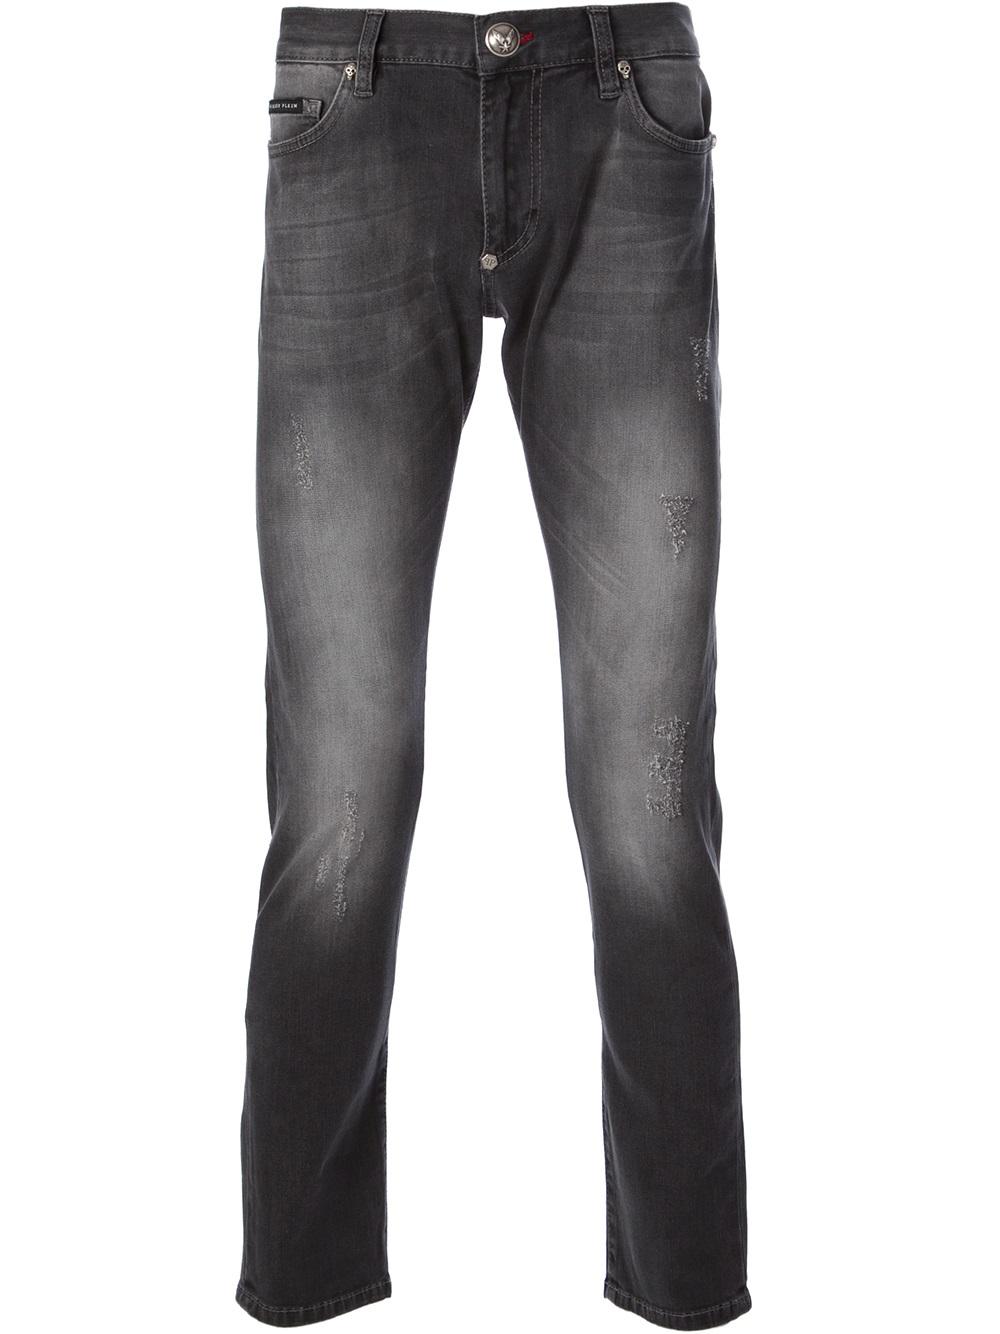 lyst philipp plein denim jeans in gray for men. Black Bedroom Furniture Sets. Home Design Ideas